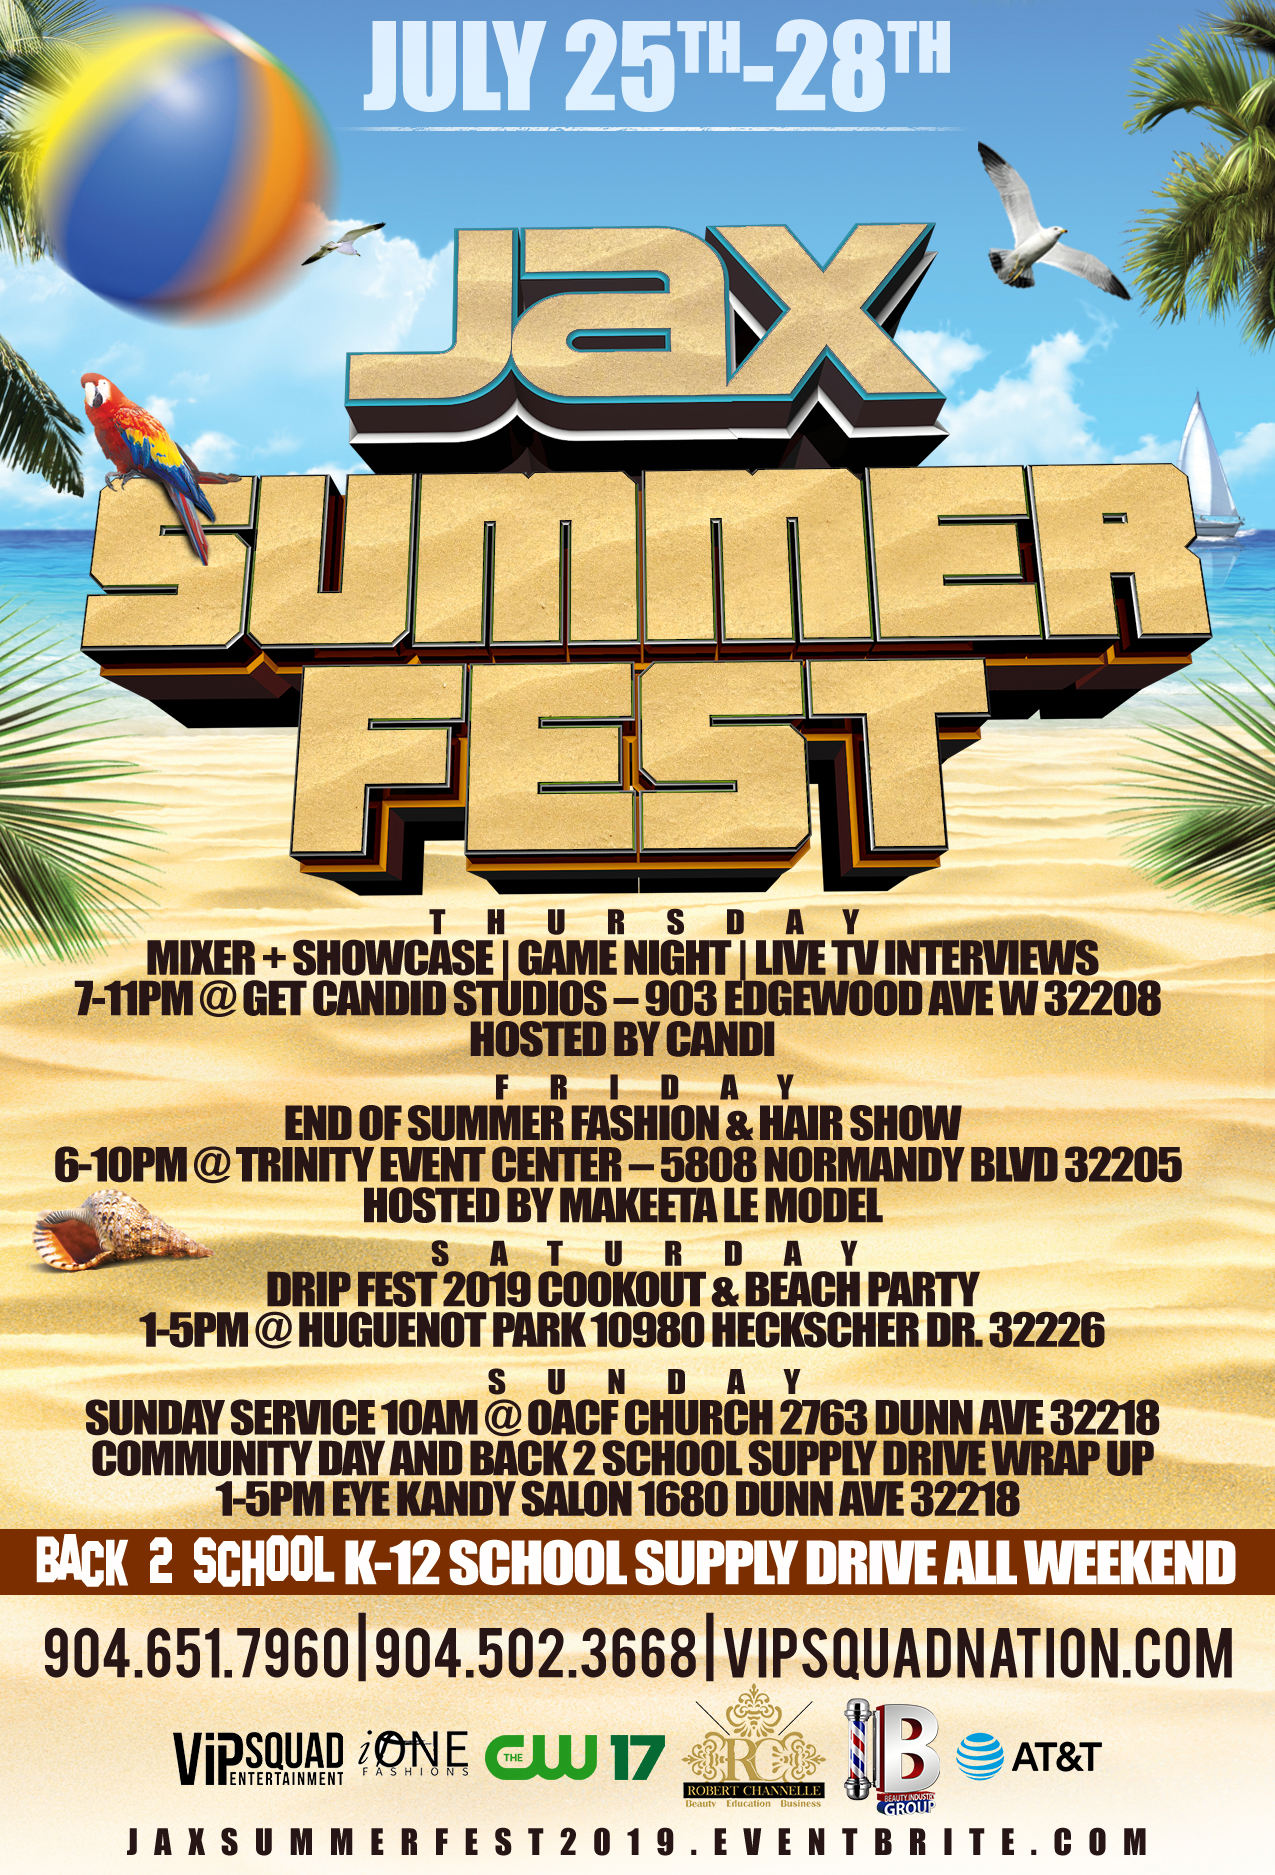 Jax Summer Music Community Fest 2019 Tickets Thu Jul 25 2019 At